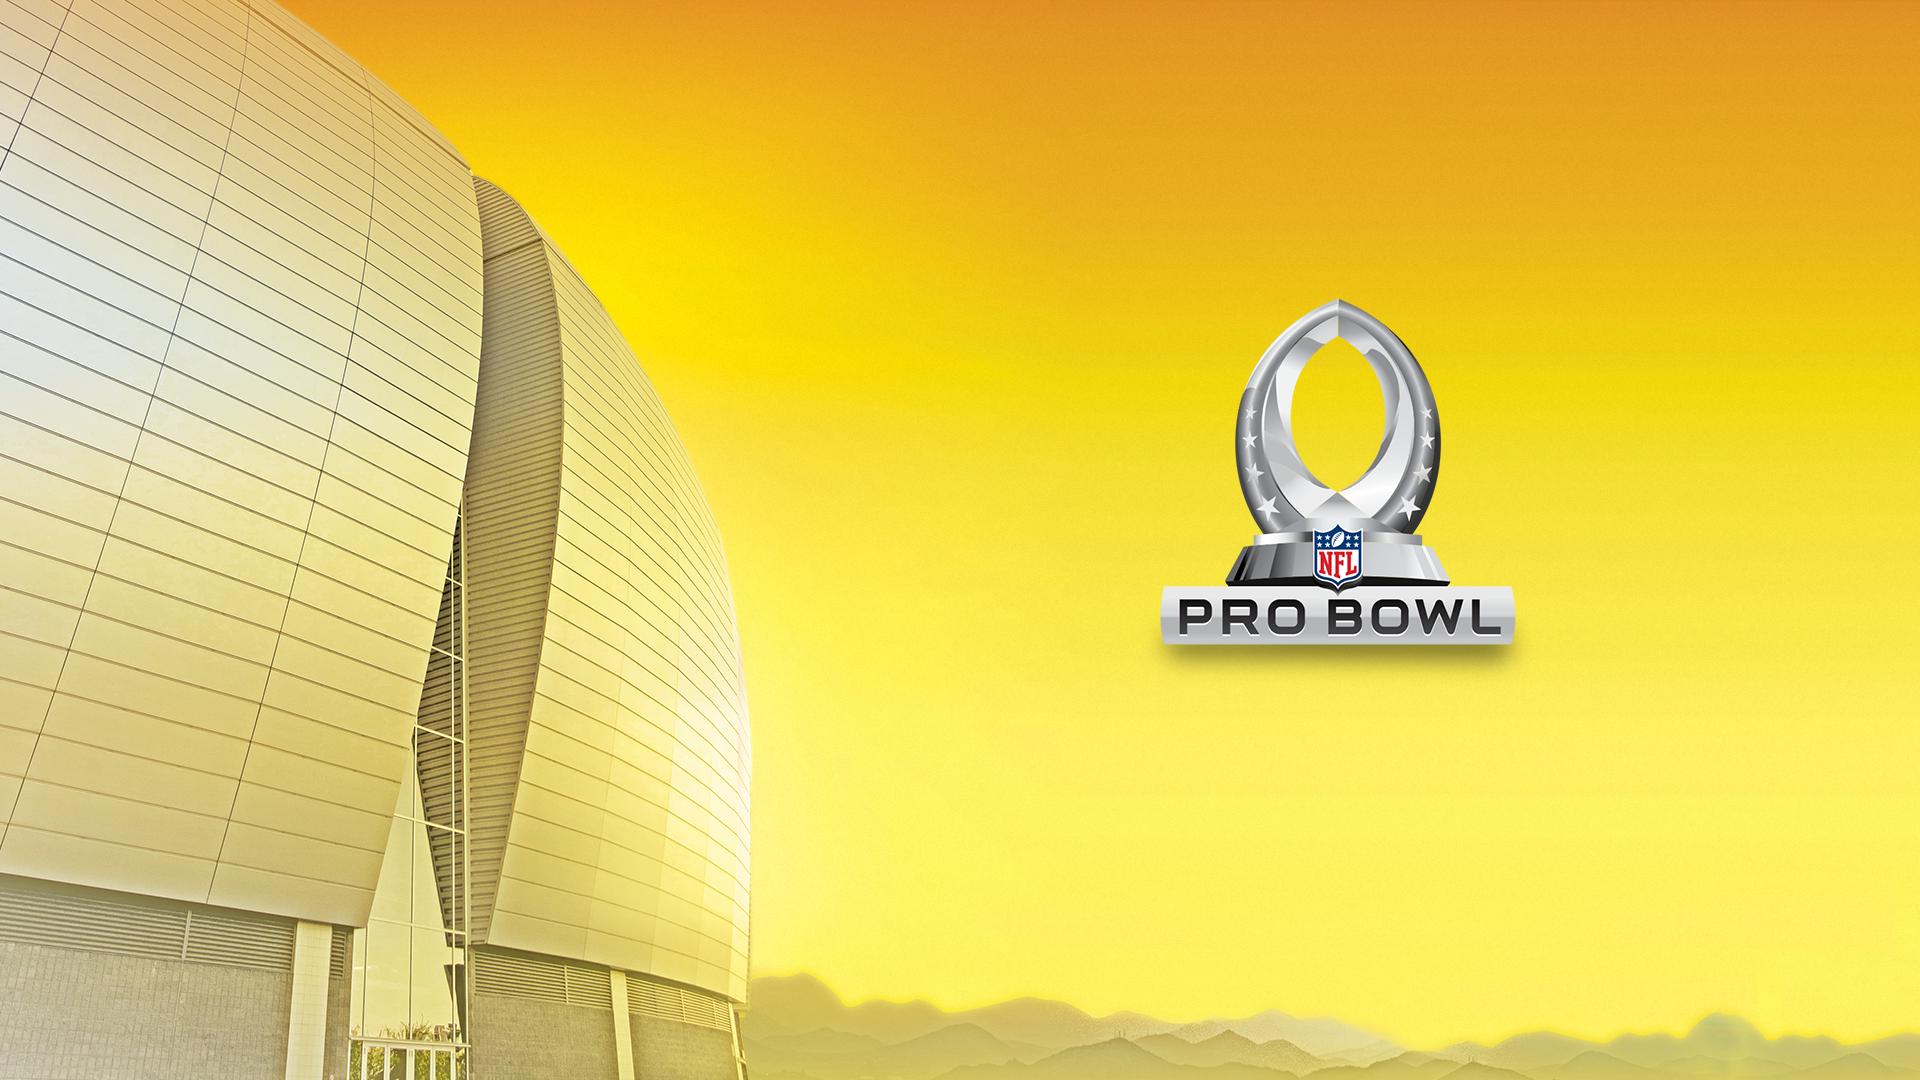 Pro Bowl Sportscaster